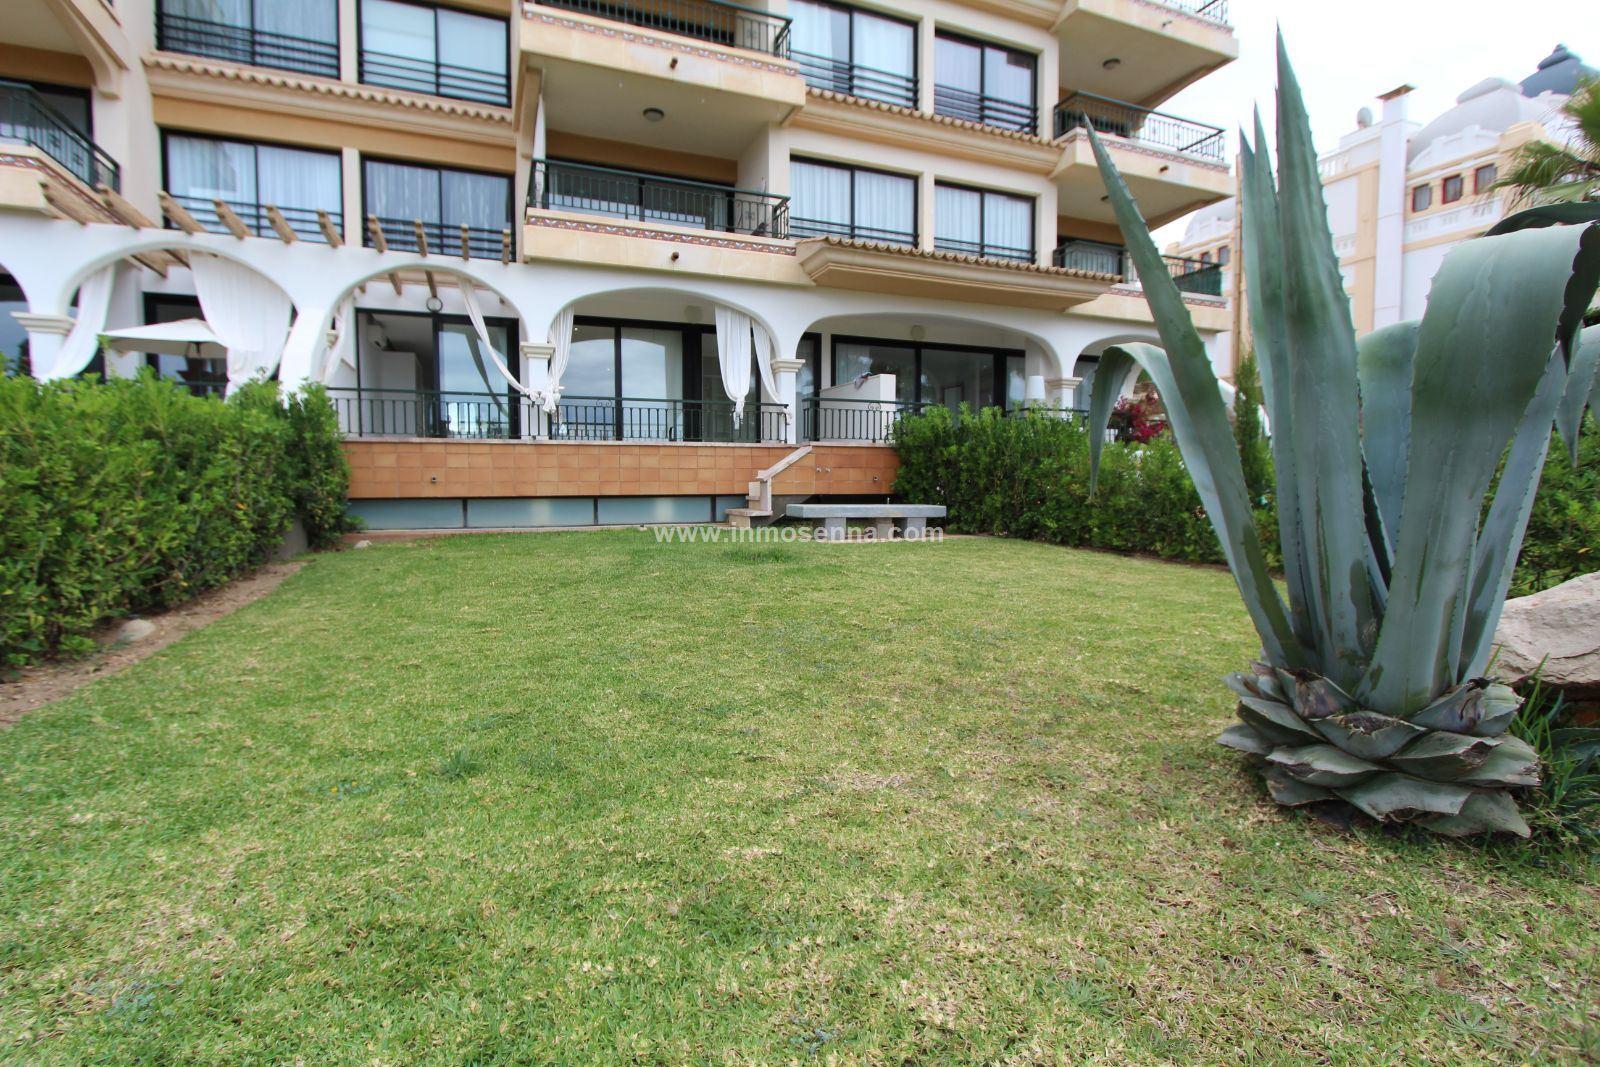 Alquiler Piso  Palma de mallorca - ciudad jardin. Alquiler frente al mar